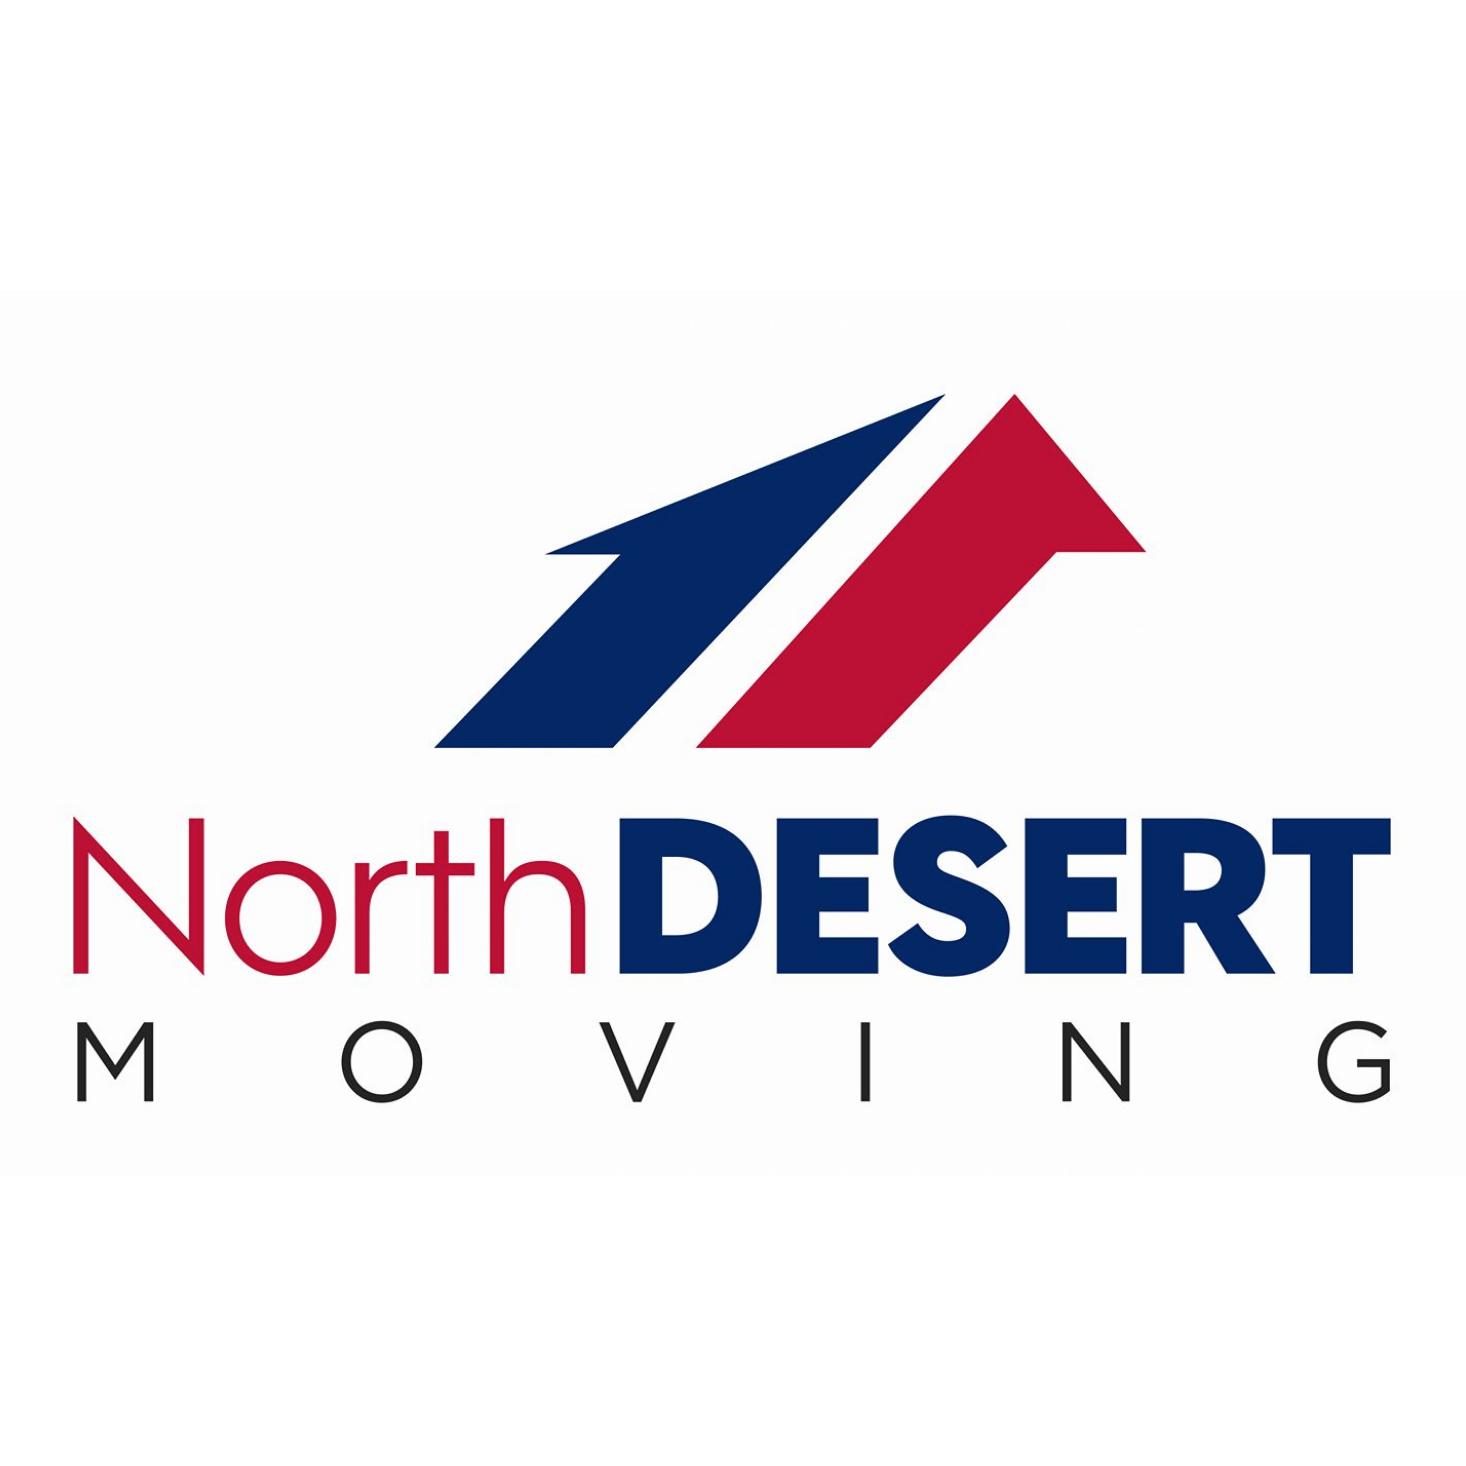 North Desert Moving LLC image 4